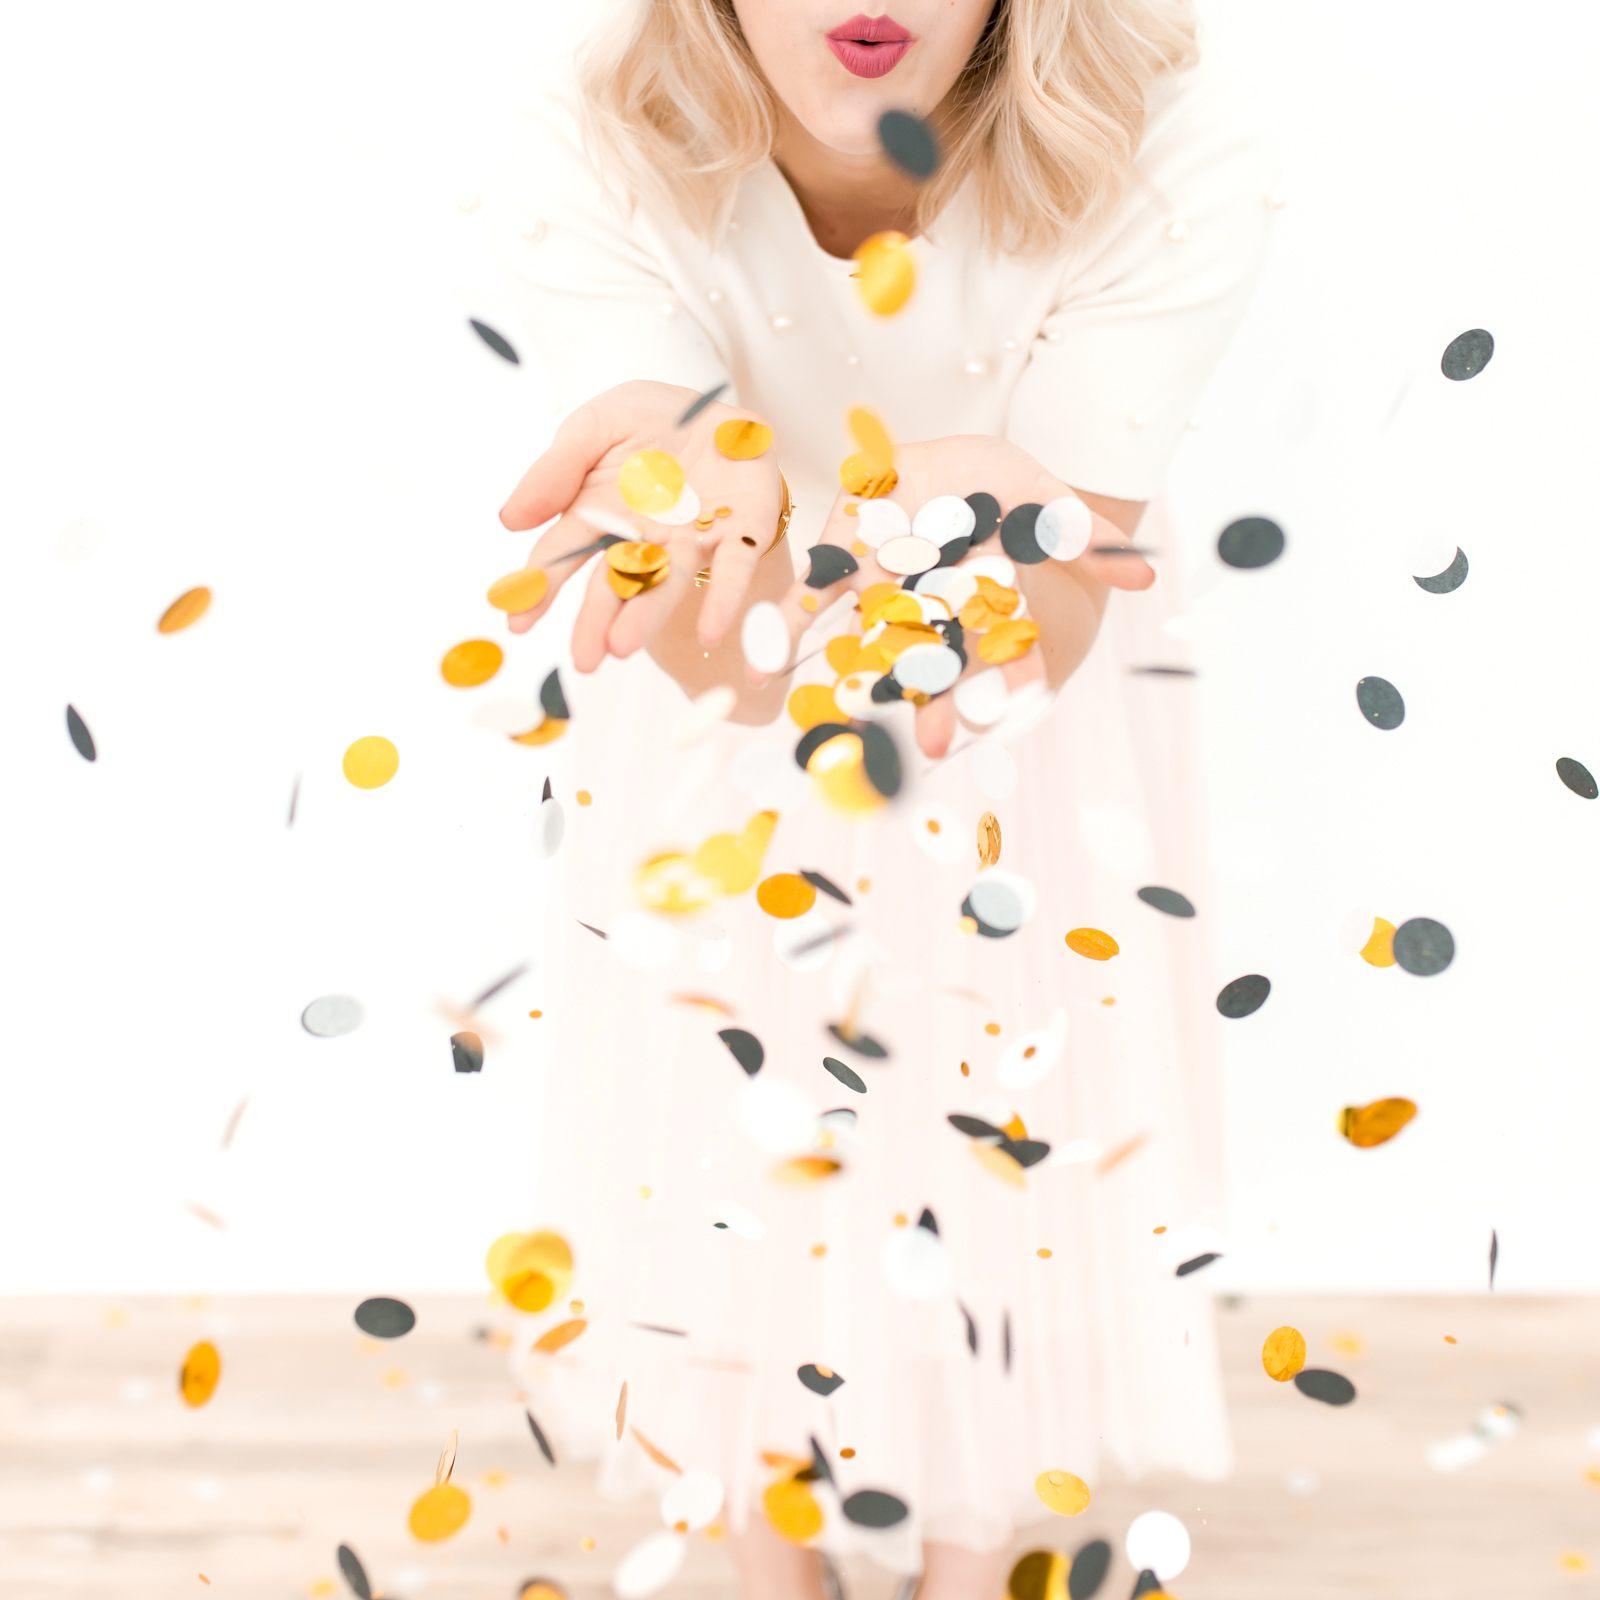 Woman throwing confetti